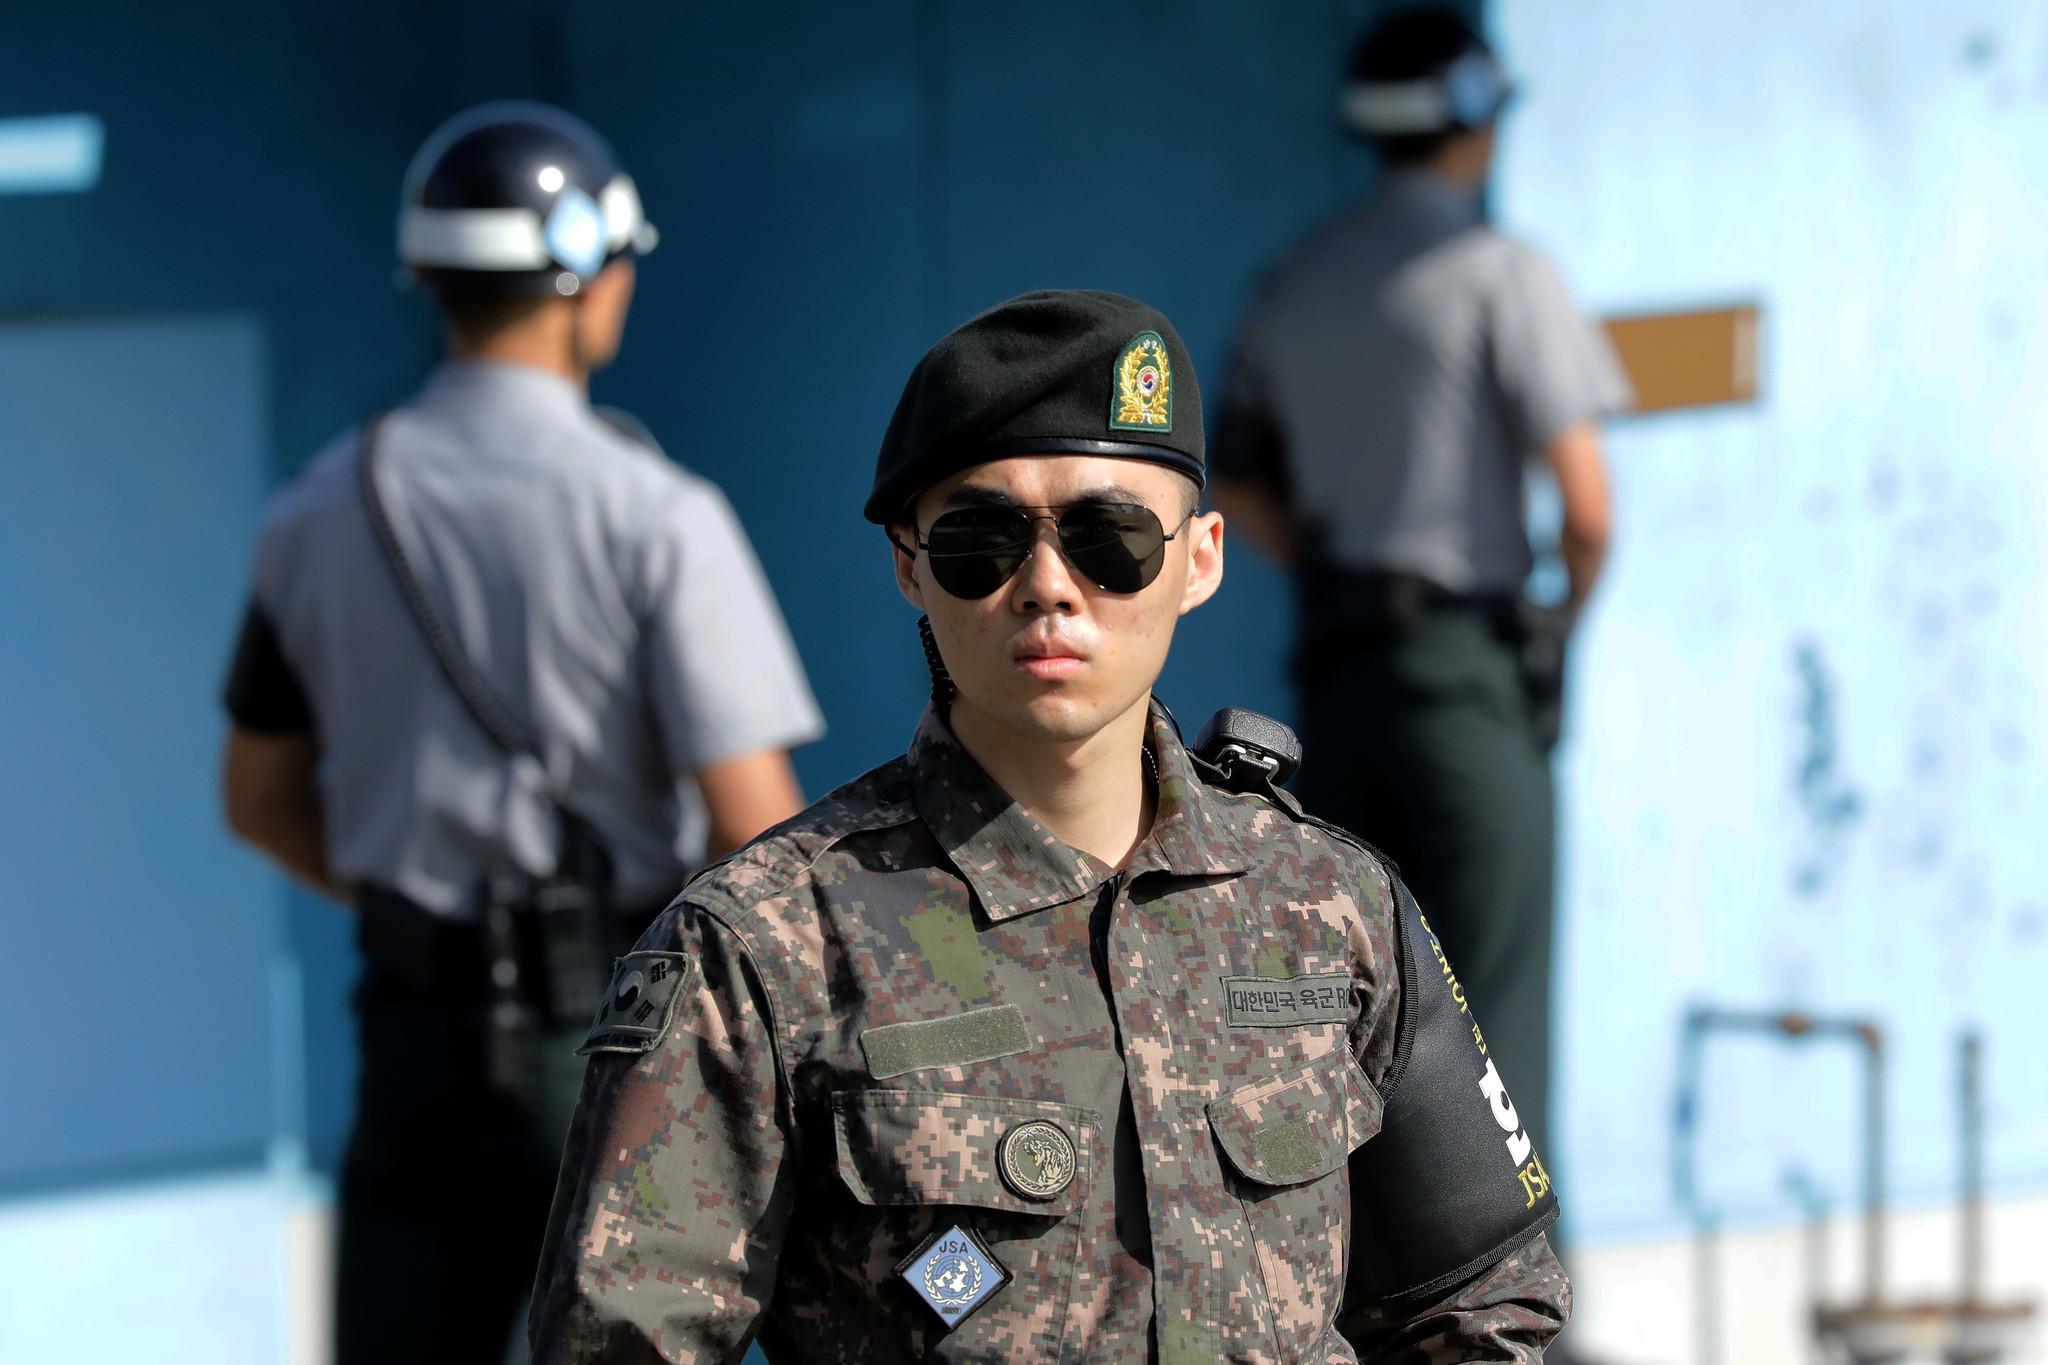 Trump likely won't visit Korean demilitarized zone during Asia trip, White House says